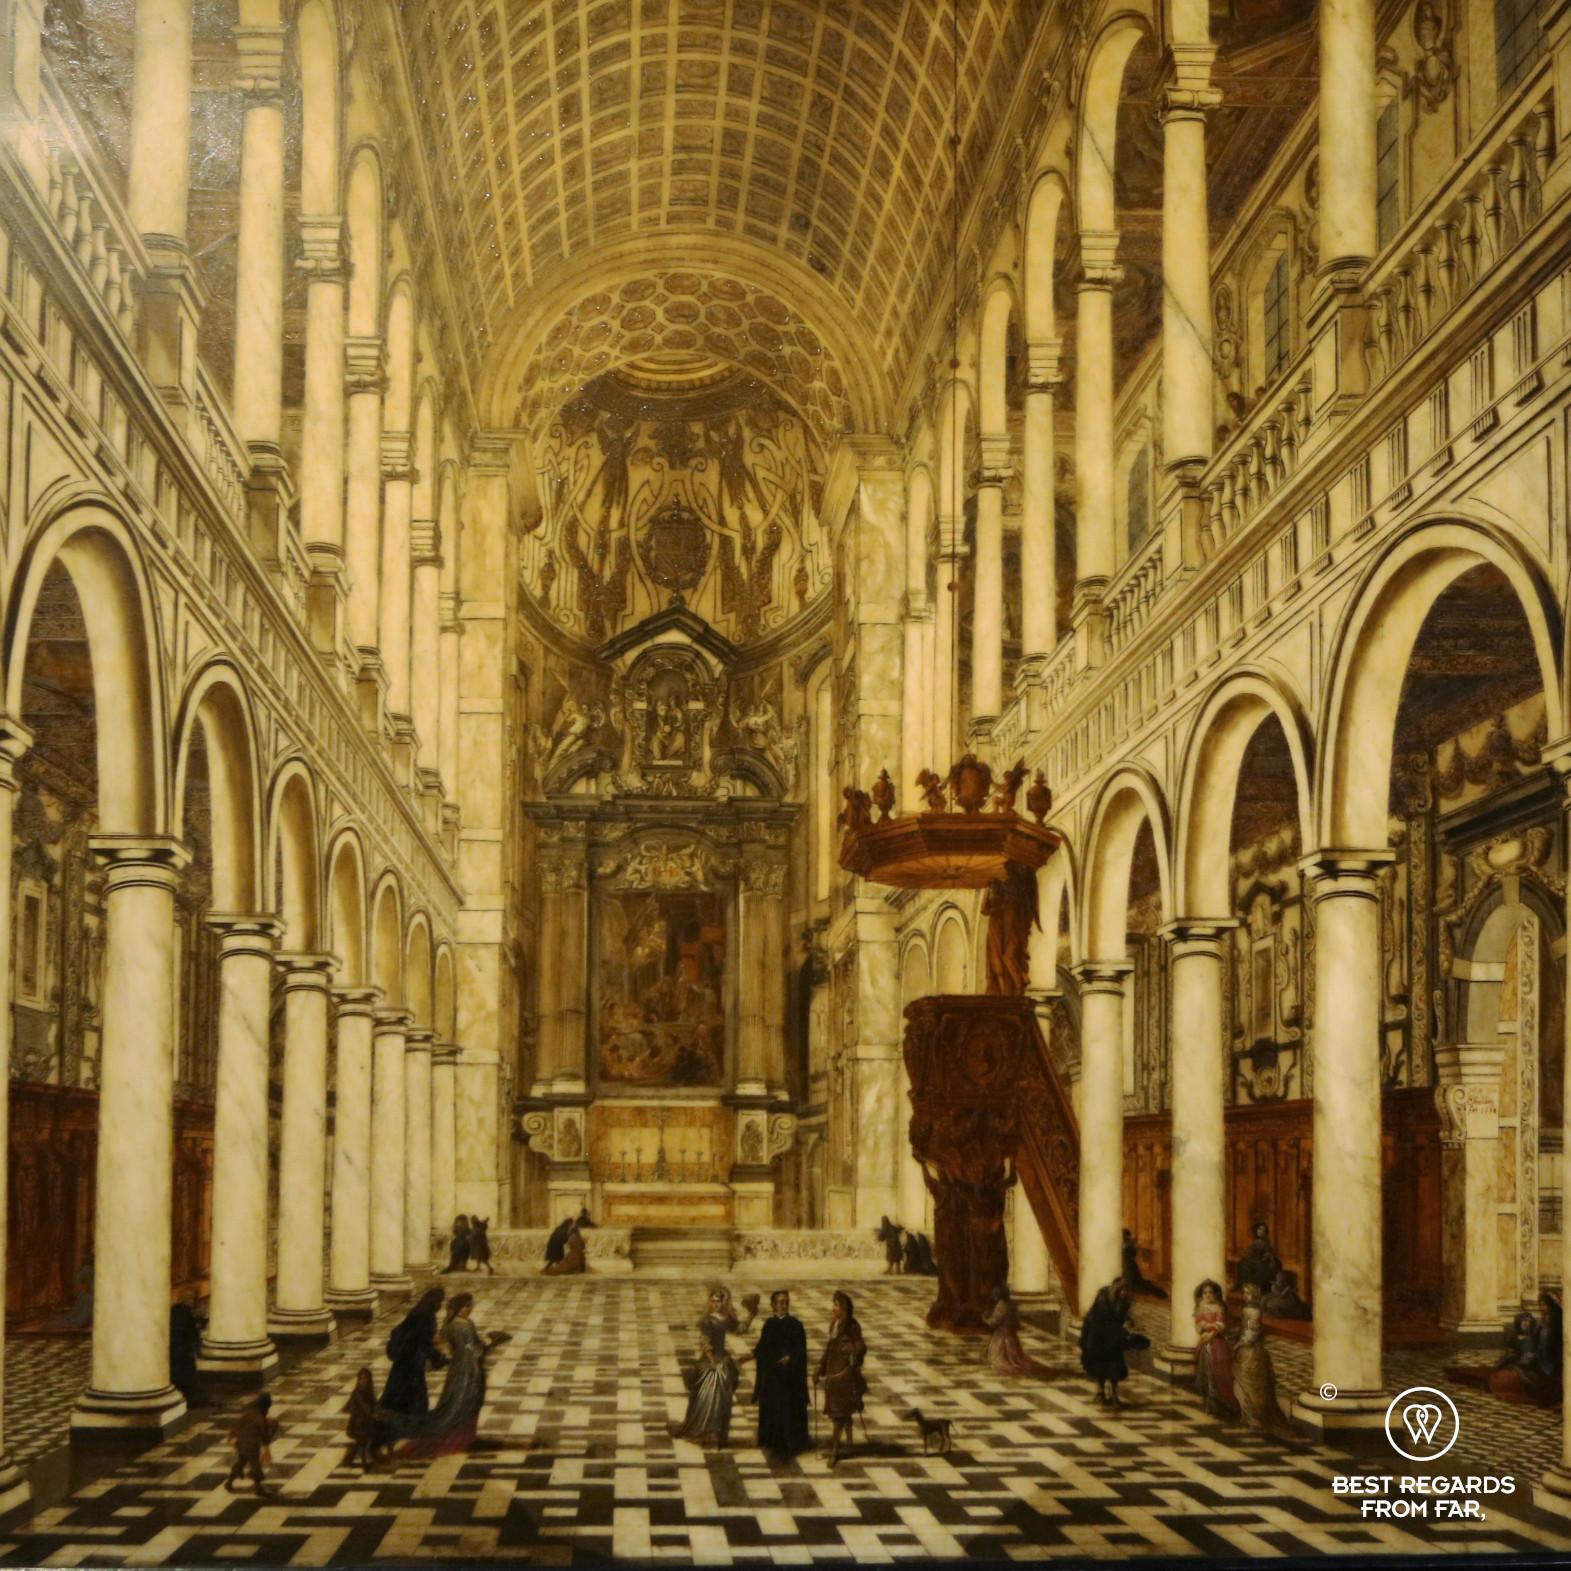 Interior of the jesuit Saint Charles Borromeo Church (1618), by Wilhem Schubert van Ehrenberg, Rubens' House, Antwerp